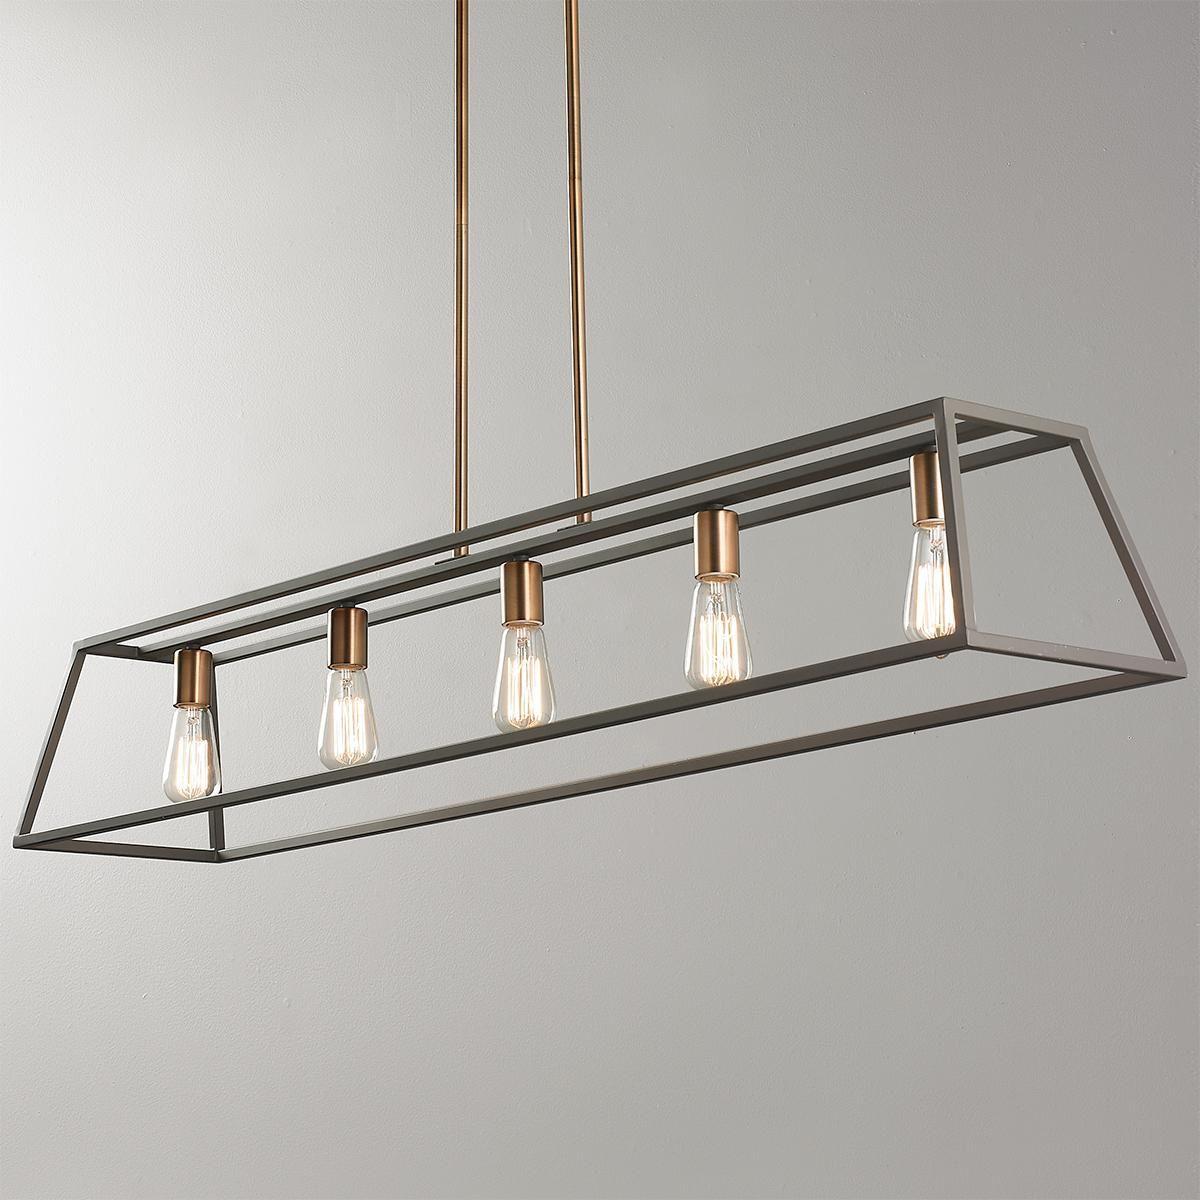 Sleek Minimalist Island Chandelier 5 Light Kitchen Lighting Over Table Pool Table Lighting Dining Table Lighting